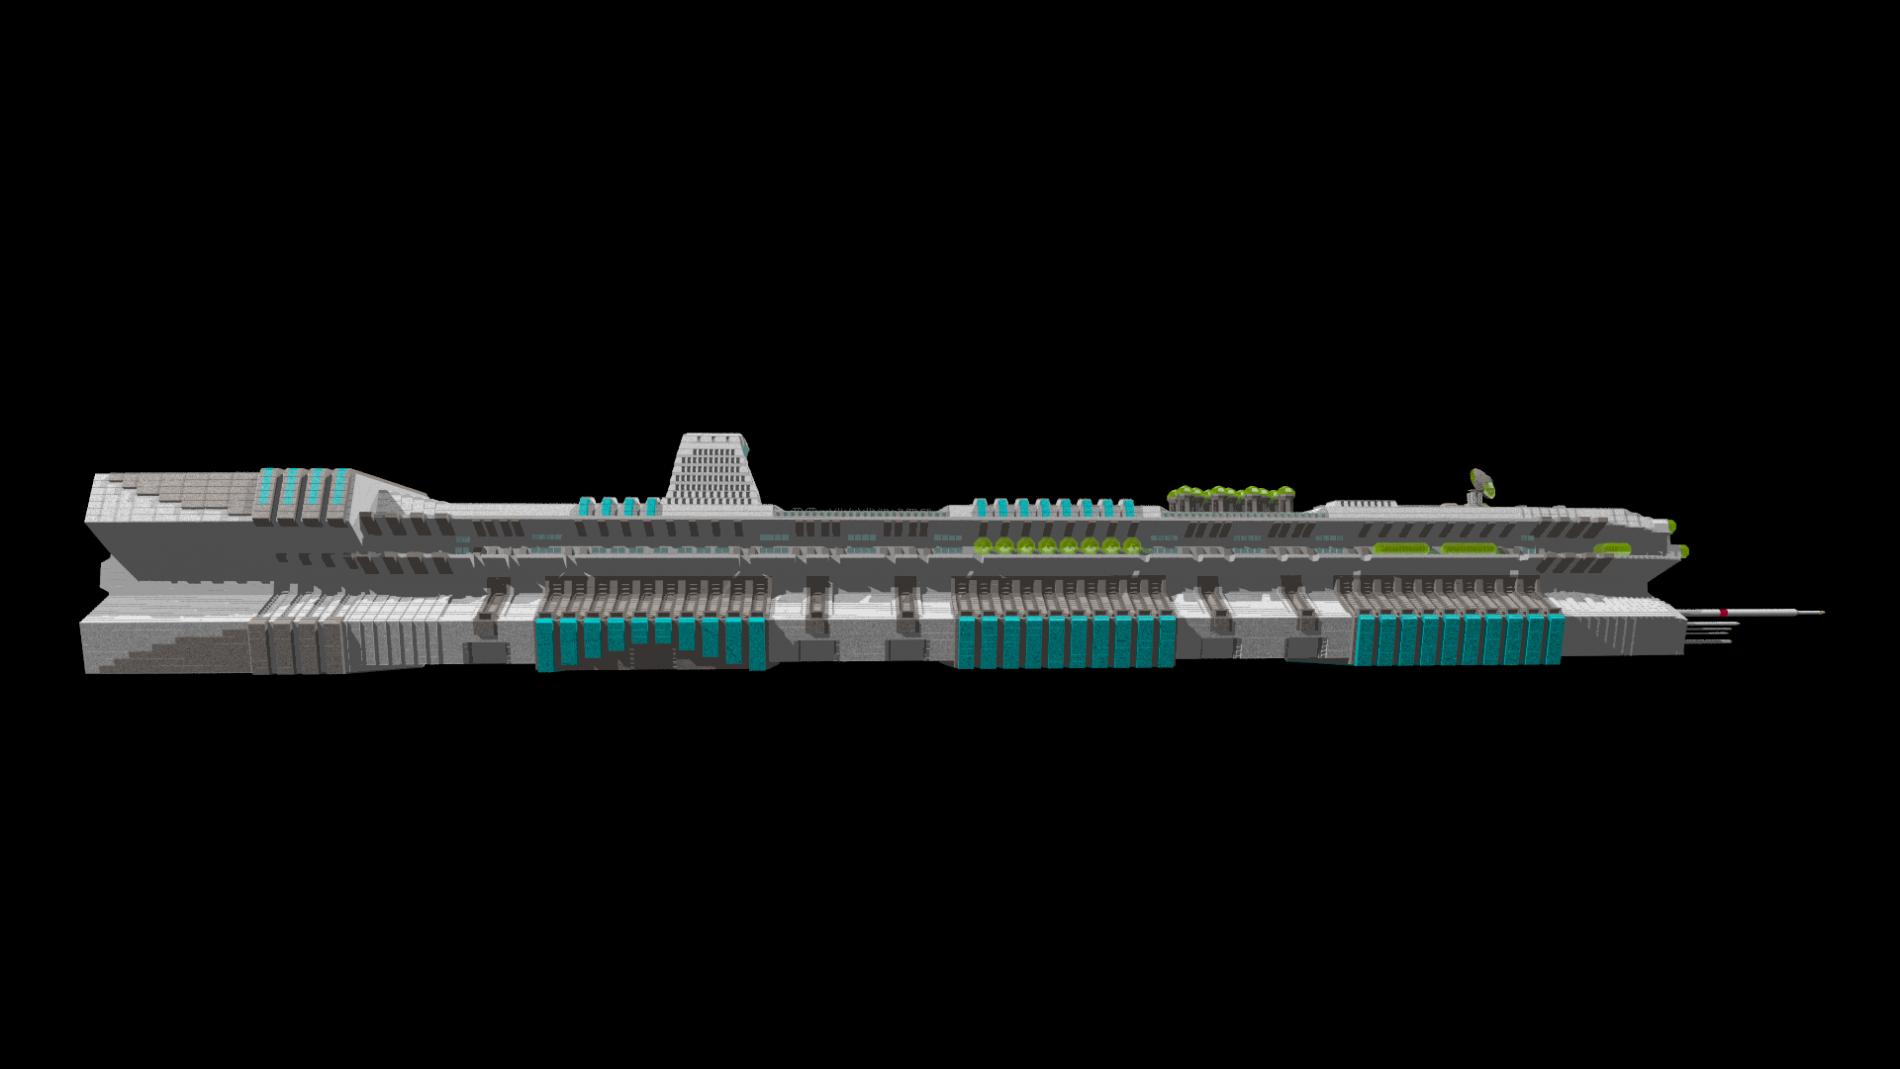 L.M.S. Explorer HD render 6